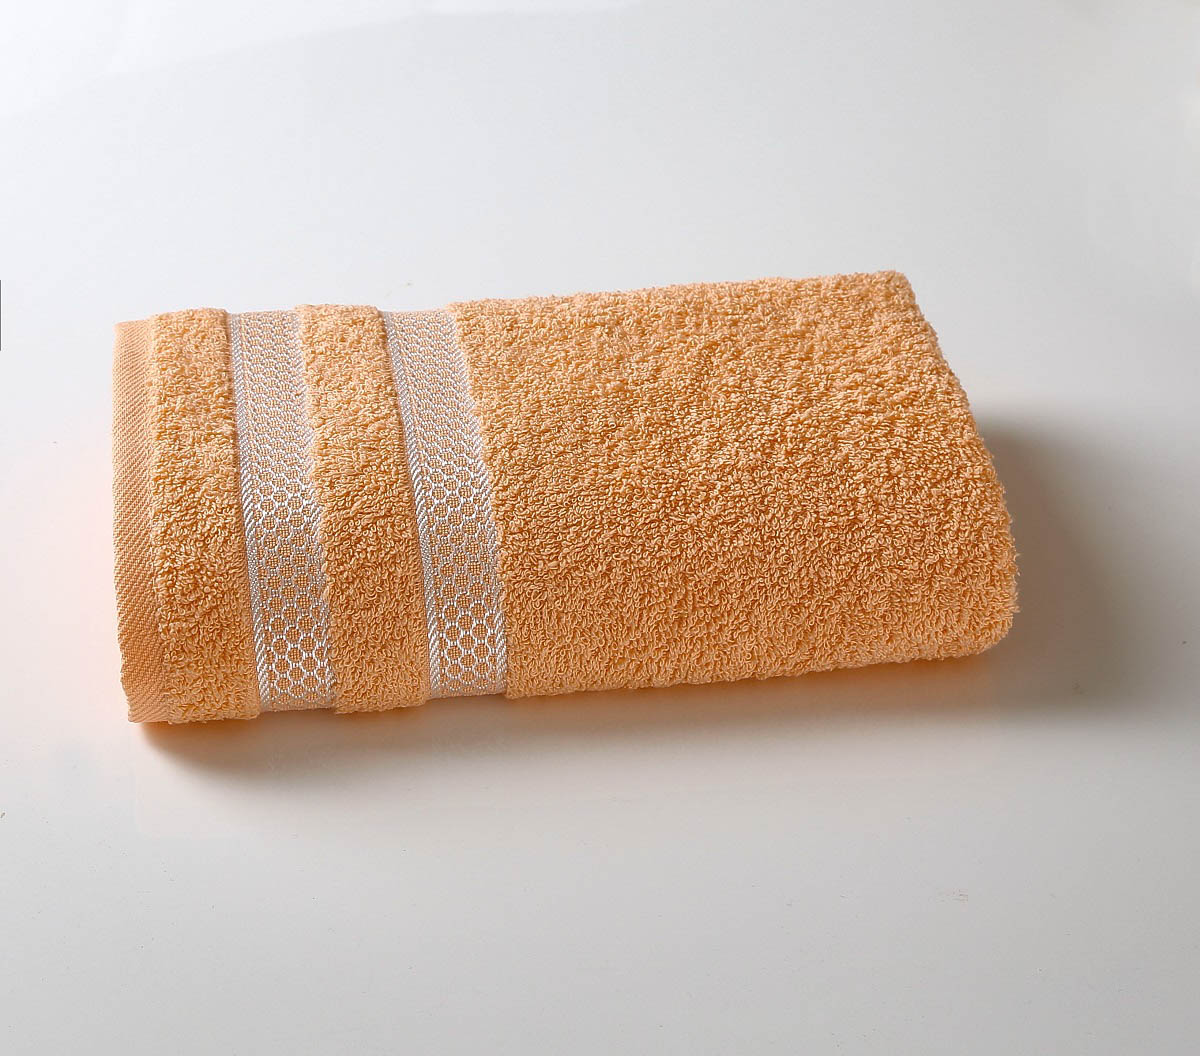 Полотенца Karna Полотенце Petek Цвет: Абрикосовый (70х140 см) karna karna полотенце innes цвет красный 70х140 см